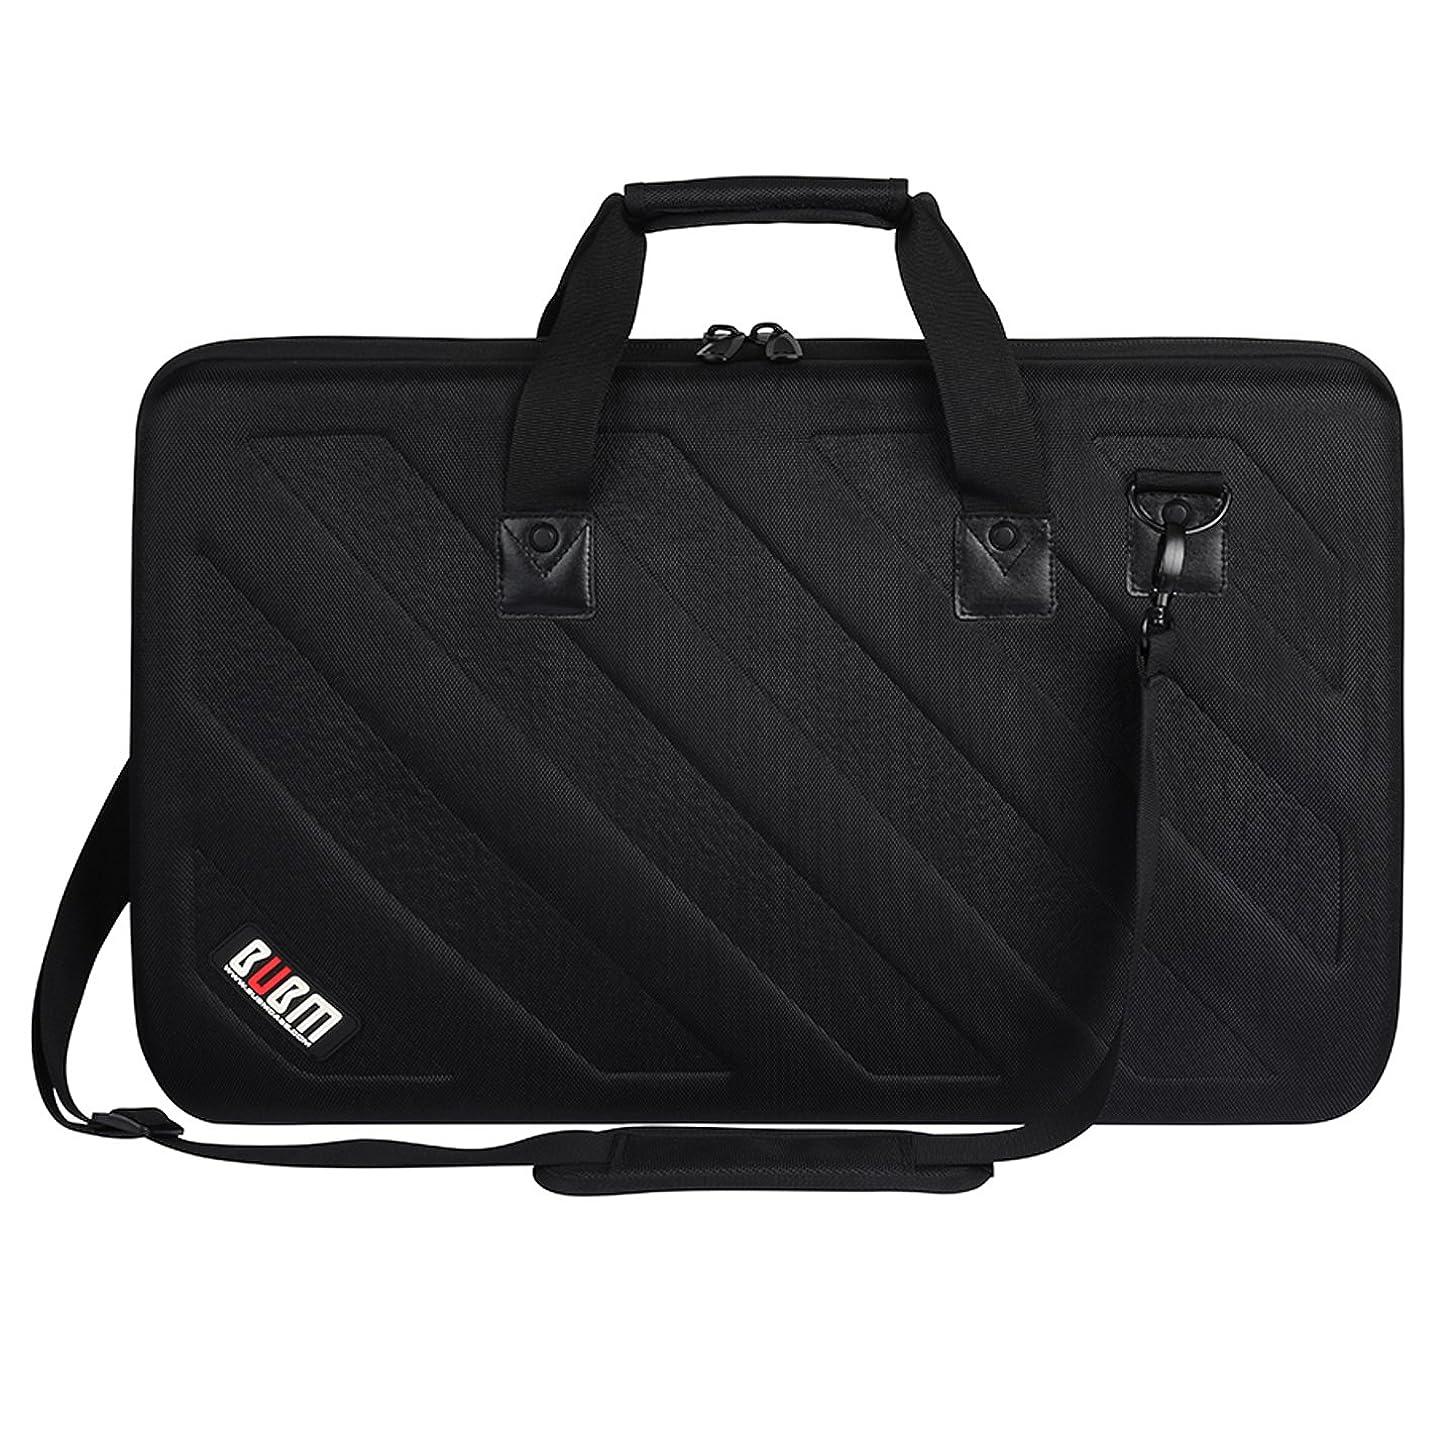 BUBM Lightweight Molded EVA Storage Case, Fits Pioneer DDJ SR SR2 RR Denon MC4000 Numark NVII Mixtrack Pro 3 NV Platinum